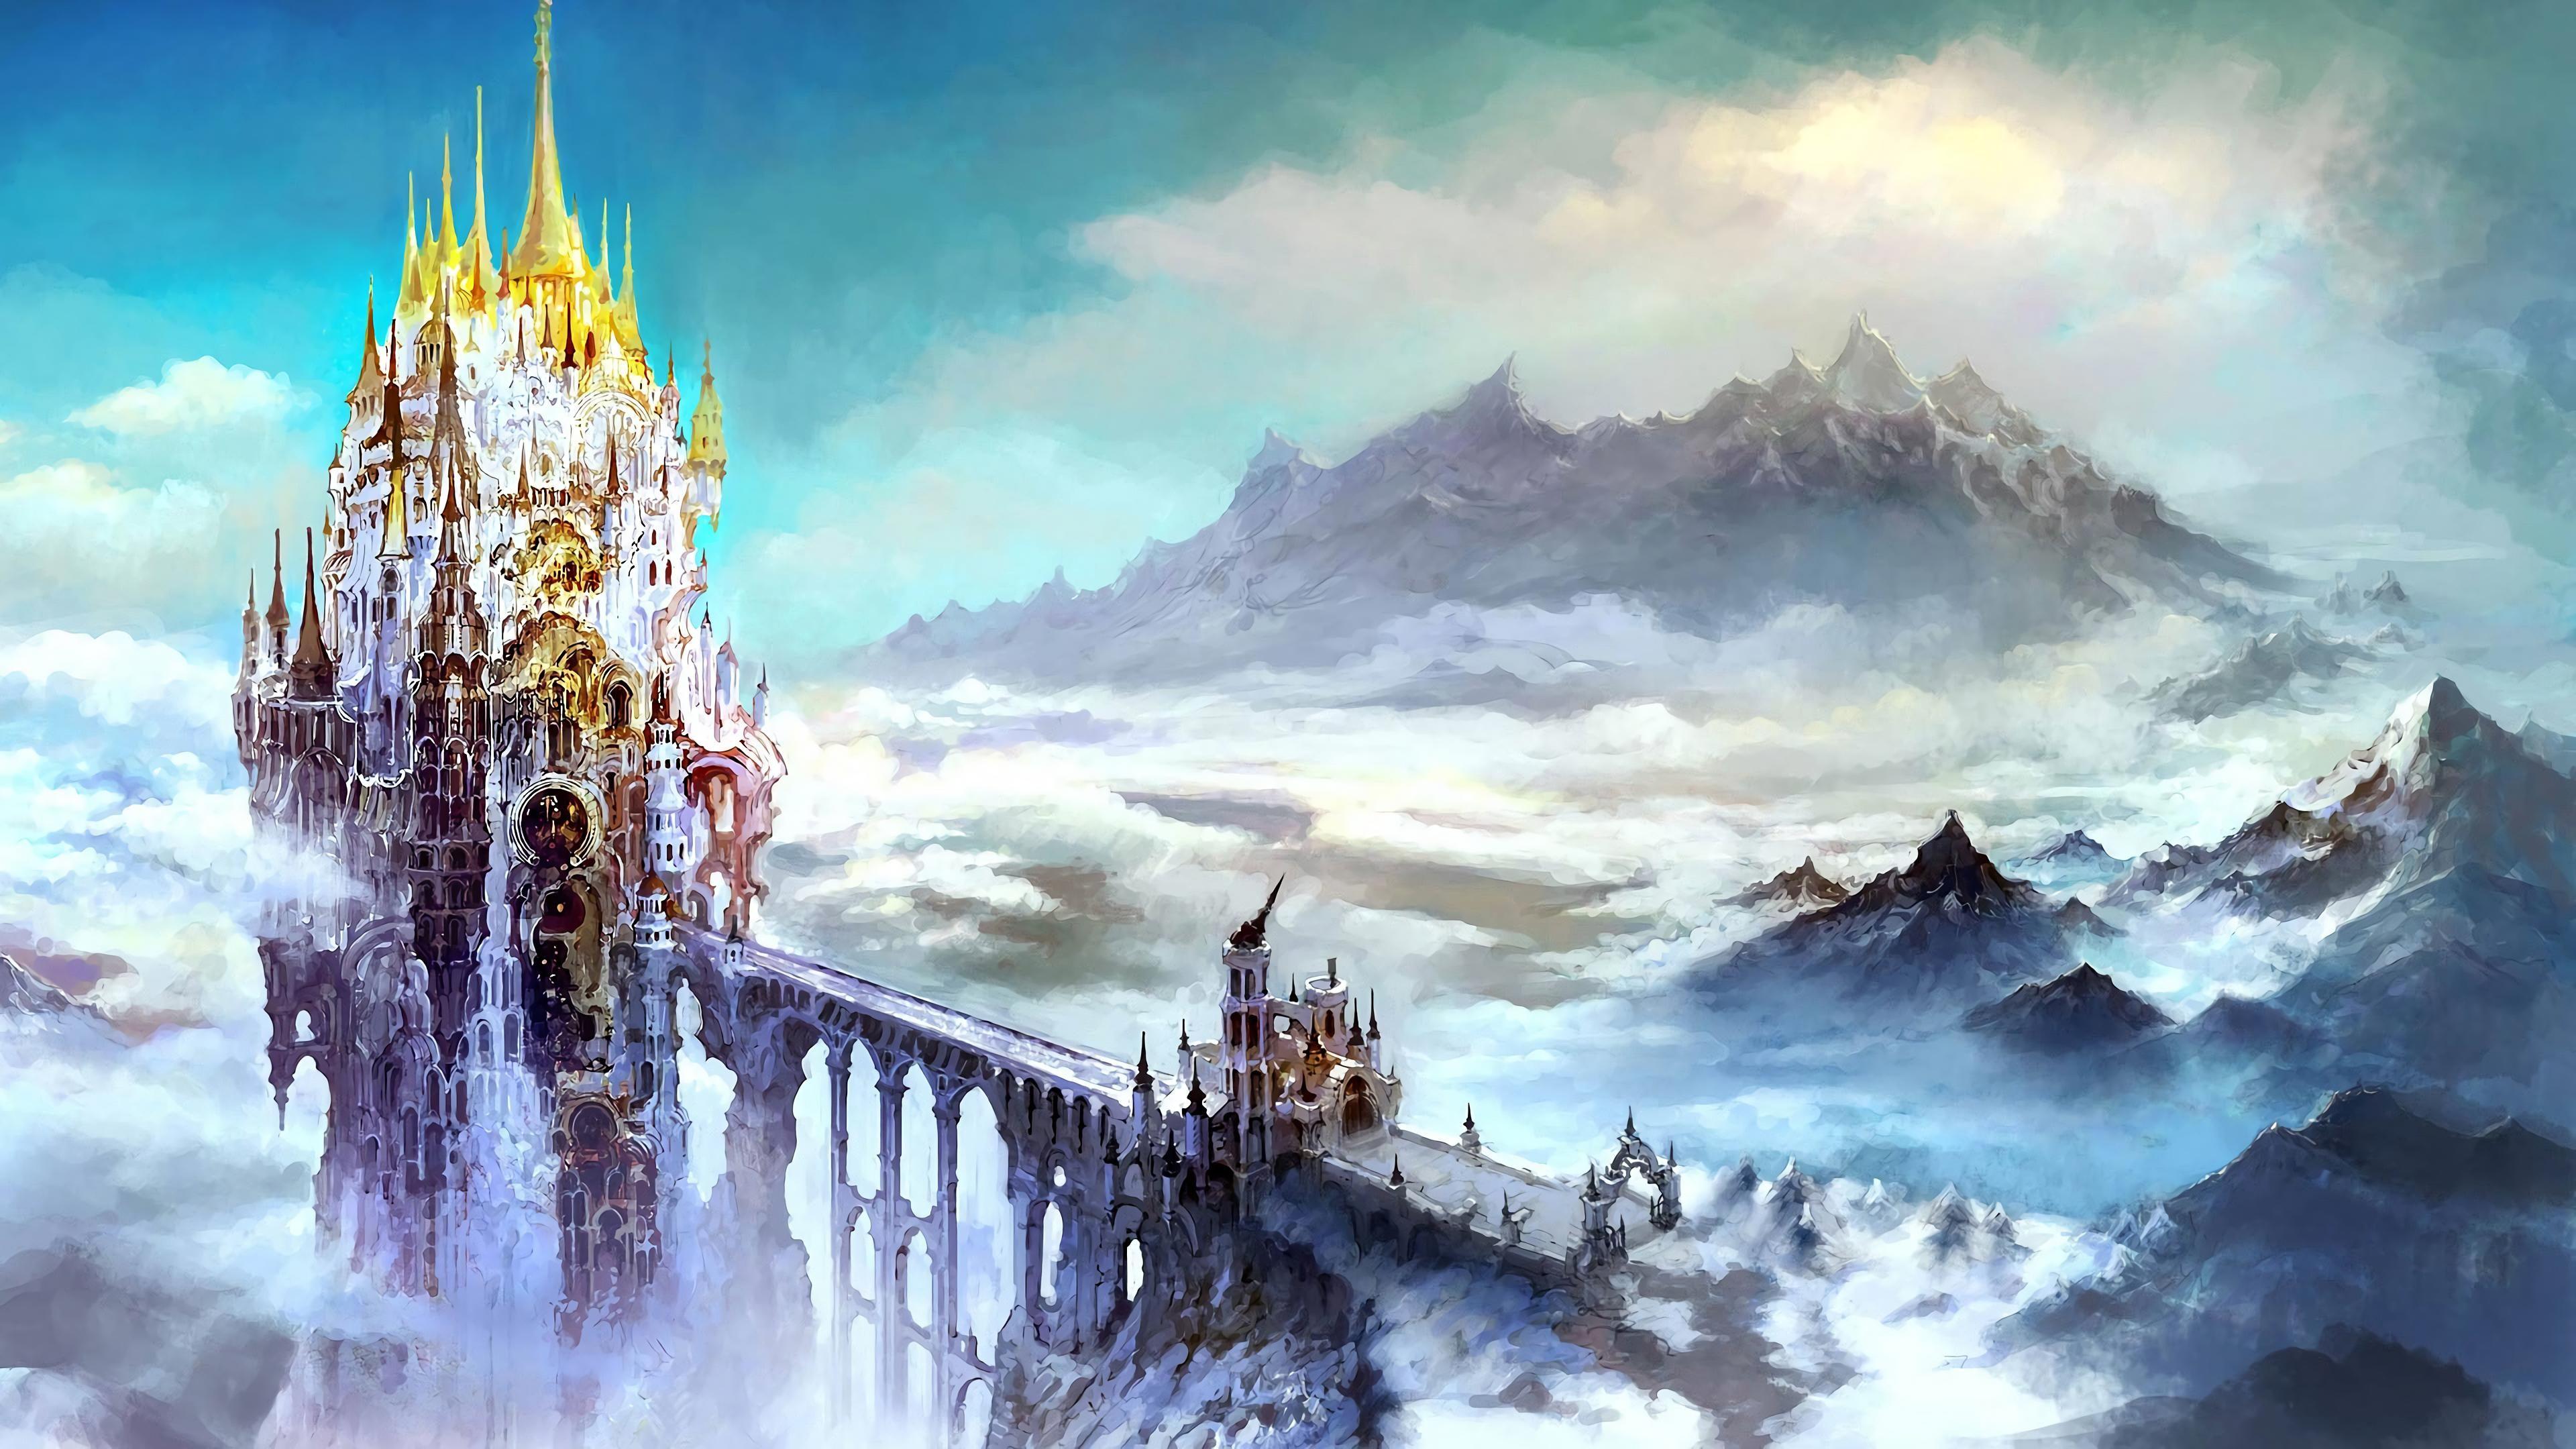 Ffxiv 4k Wallpaper Album Fantasy Concept Art Fantasy Landscape Final Fantasy Artwork